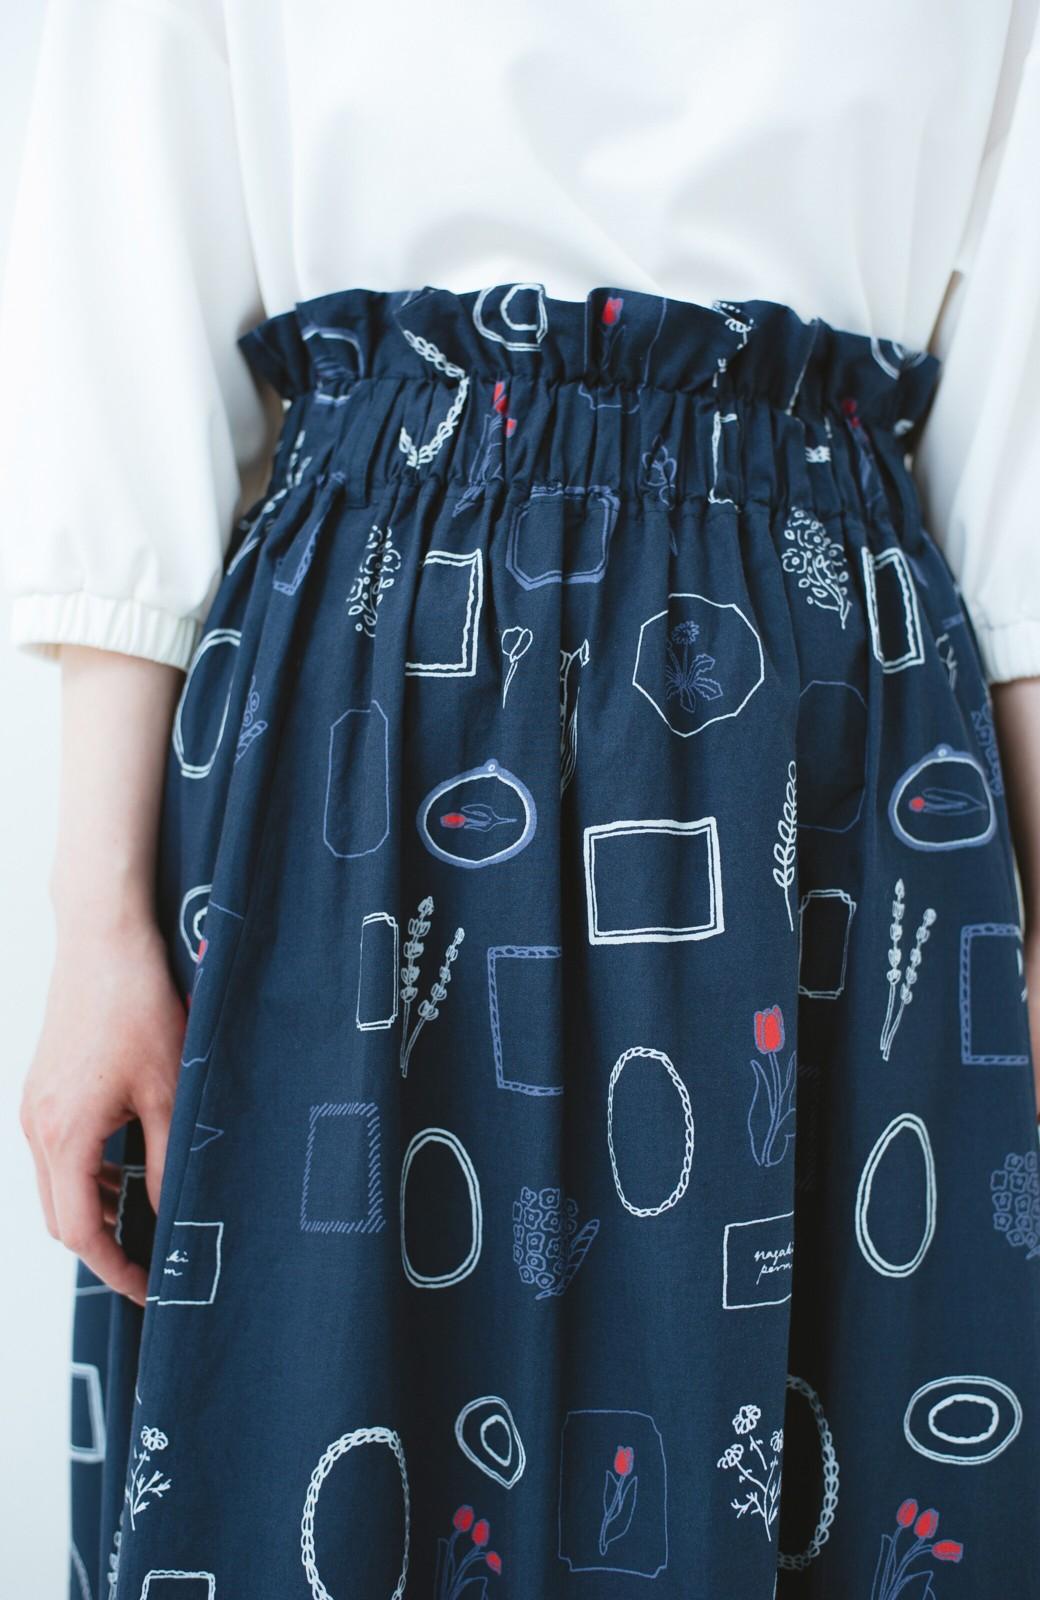 haco! PBP minne作家 ナガキパーマさんと作ったオーガニックコットンの綿麻総柄プリントスカート by haco!×minne one+more project  <ネイビー>の商品写真2